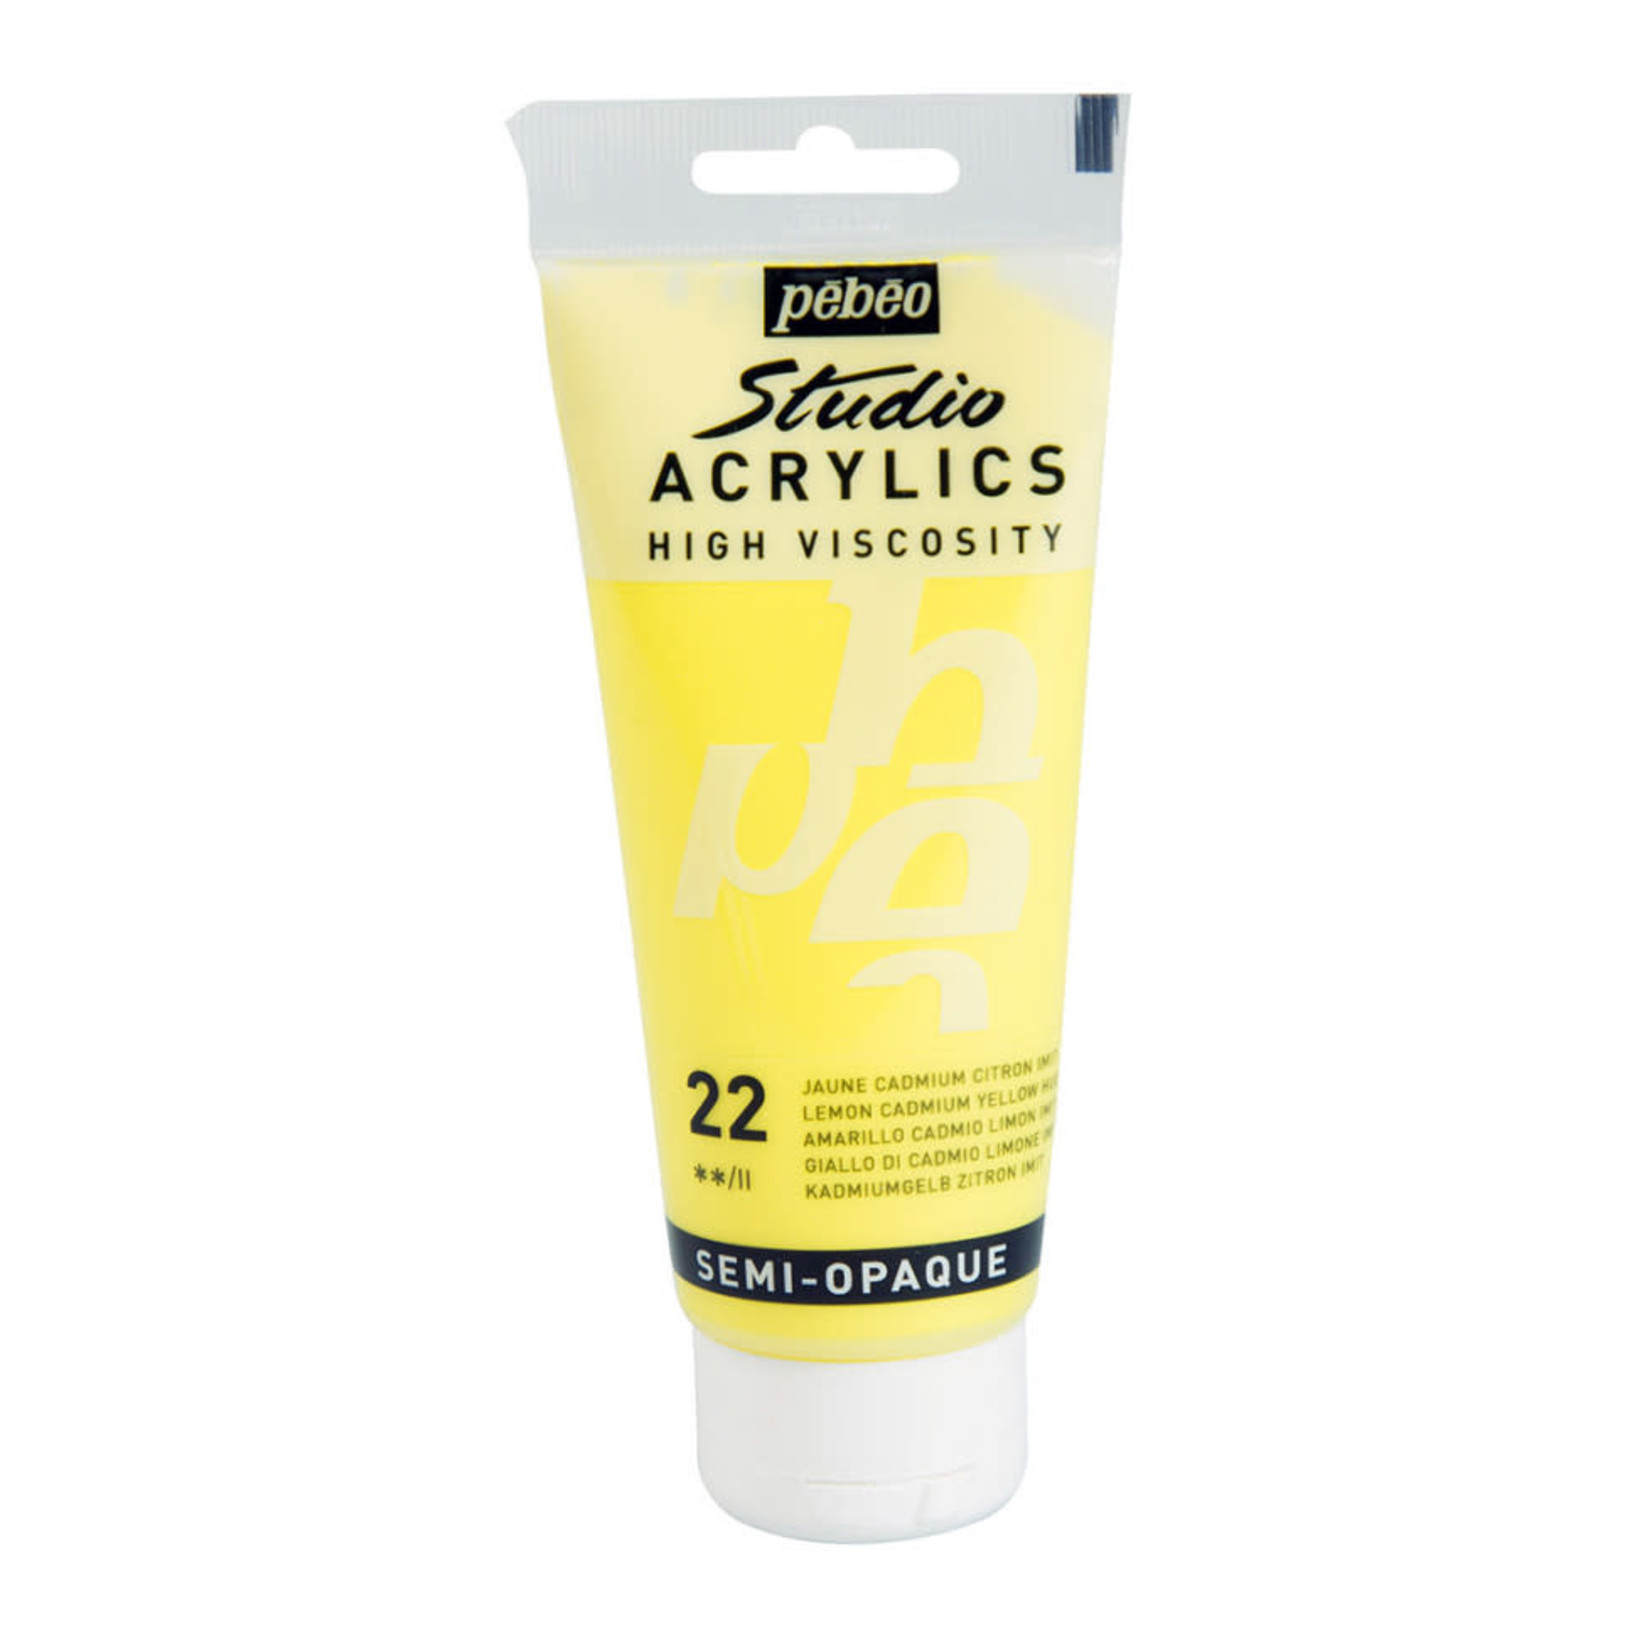 Pebeo Pebeo Acrylic Lemon Cadmium Yellow Semi-Opaque